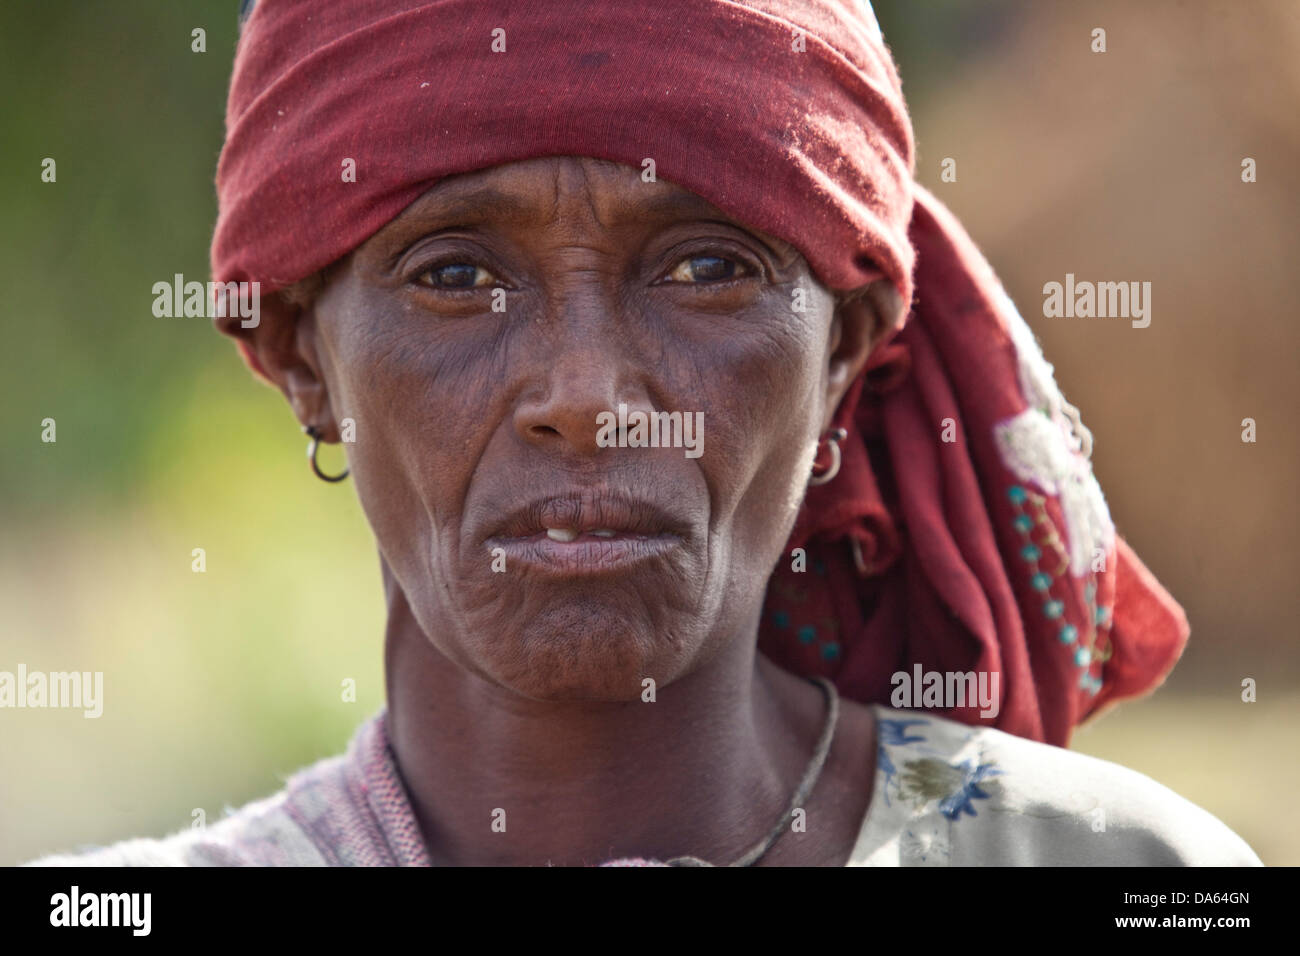 Persone, Oromo, Etiopia, tribù, Africa, donne, gruppo, Immagini Stock